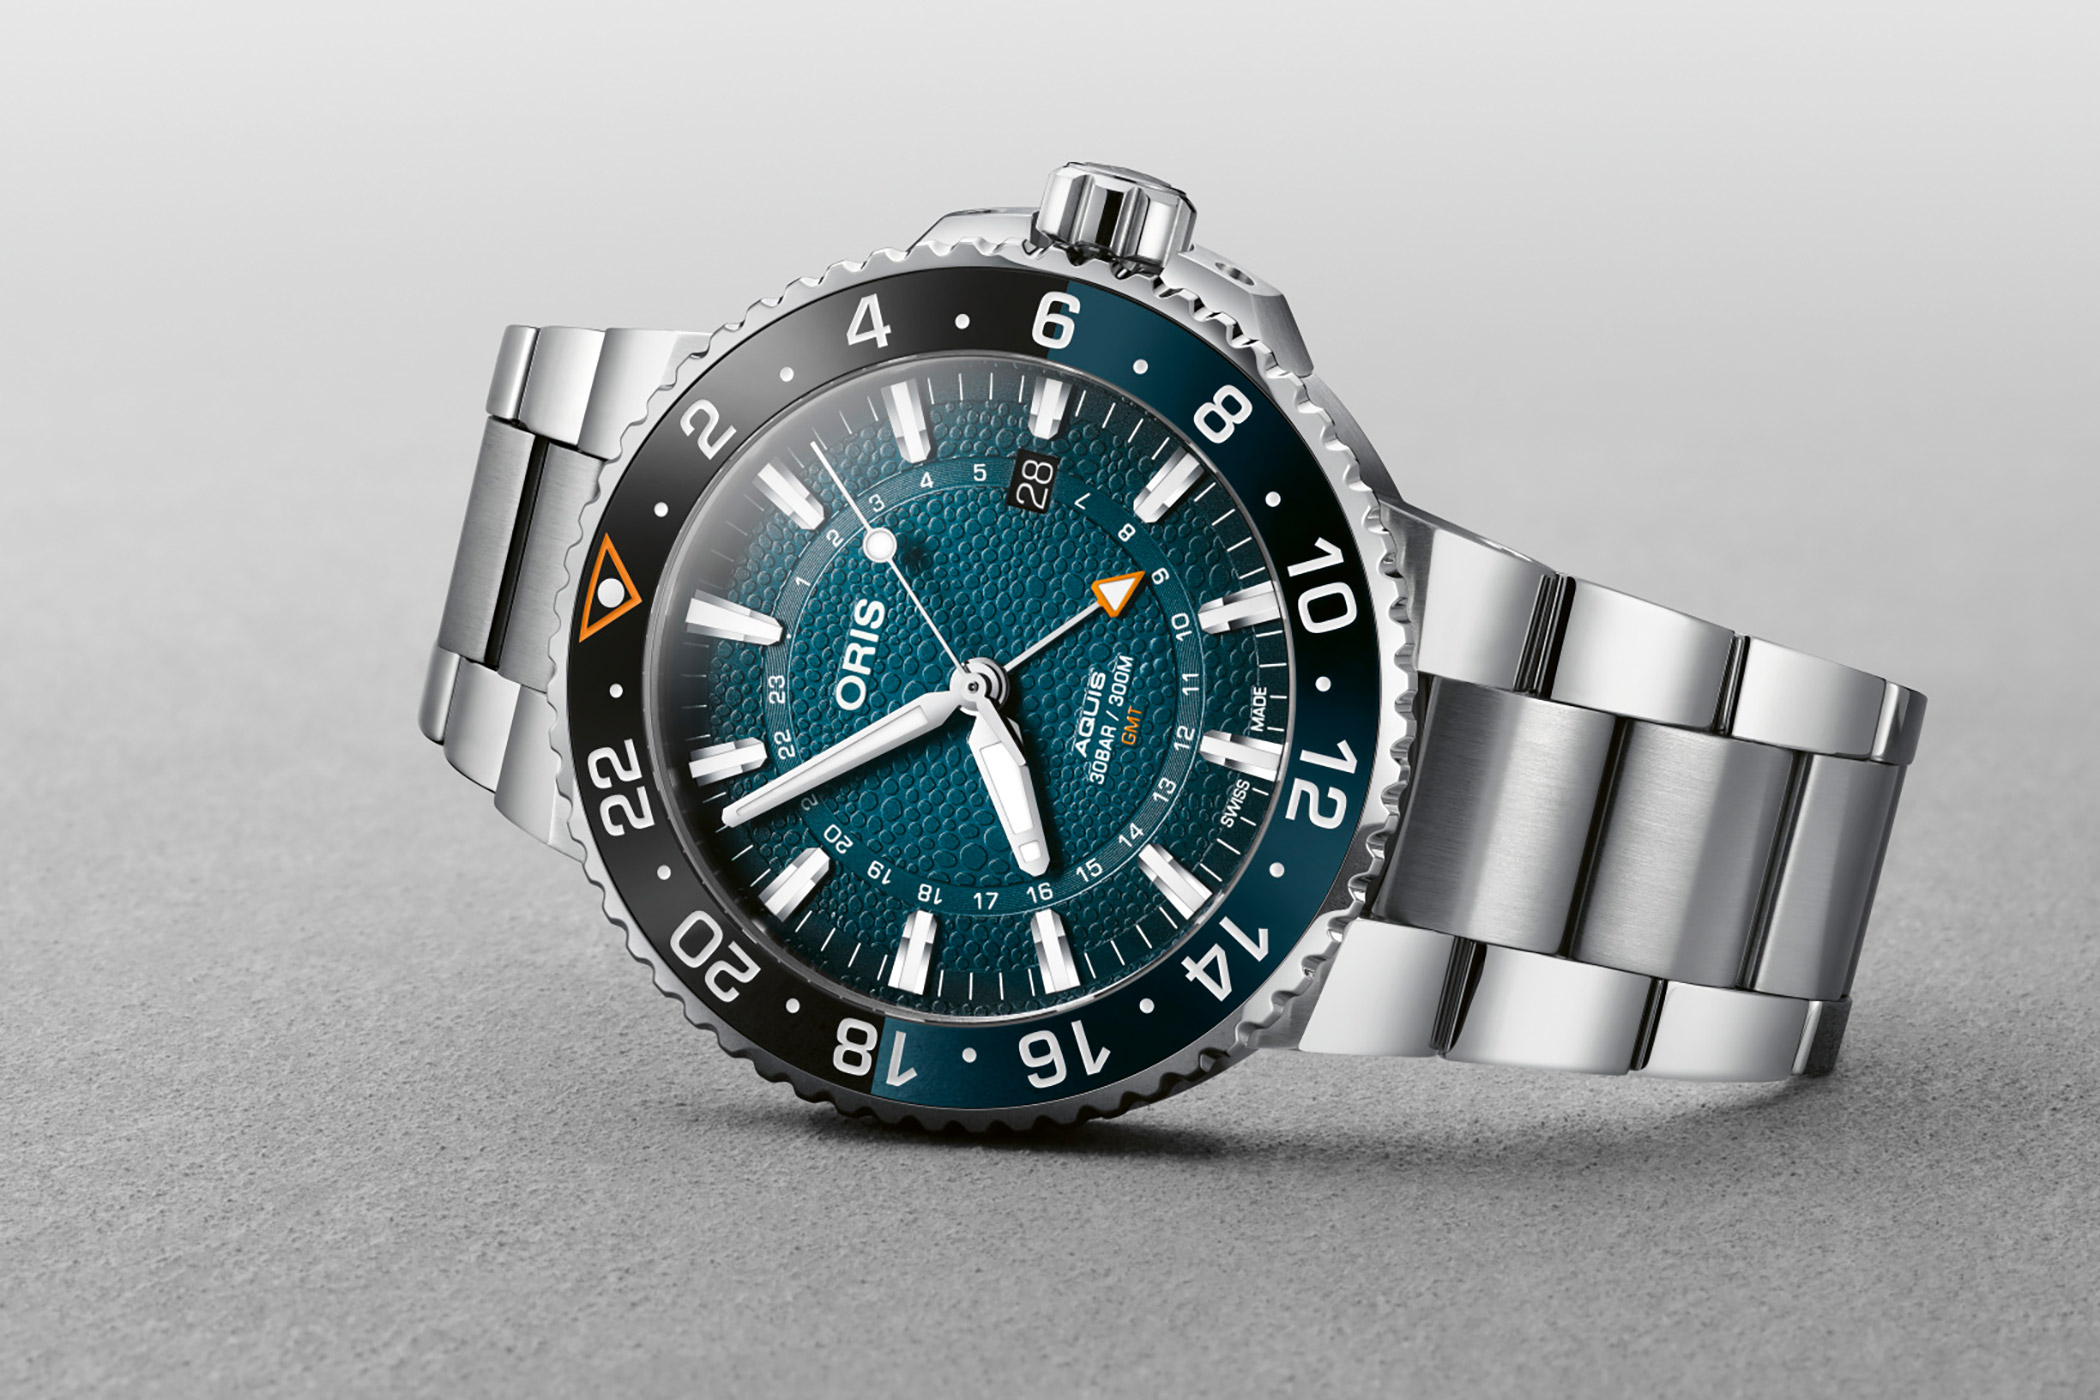 Oris-Aquis-GMT-Date-Whale-Shark-Limited-Edition-01-798-7754-4175-Set.jpg